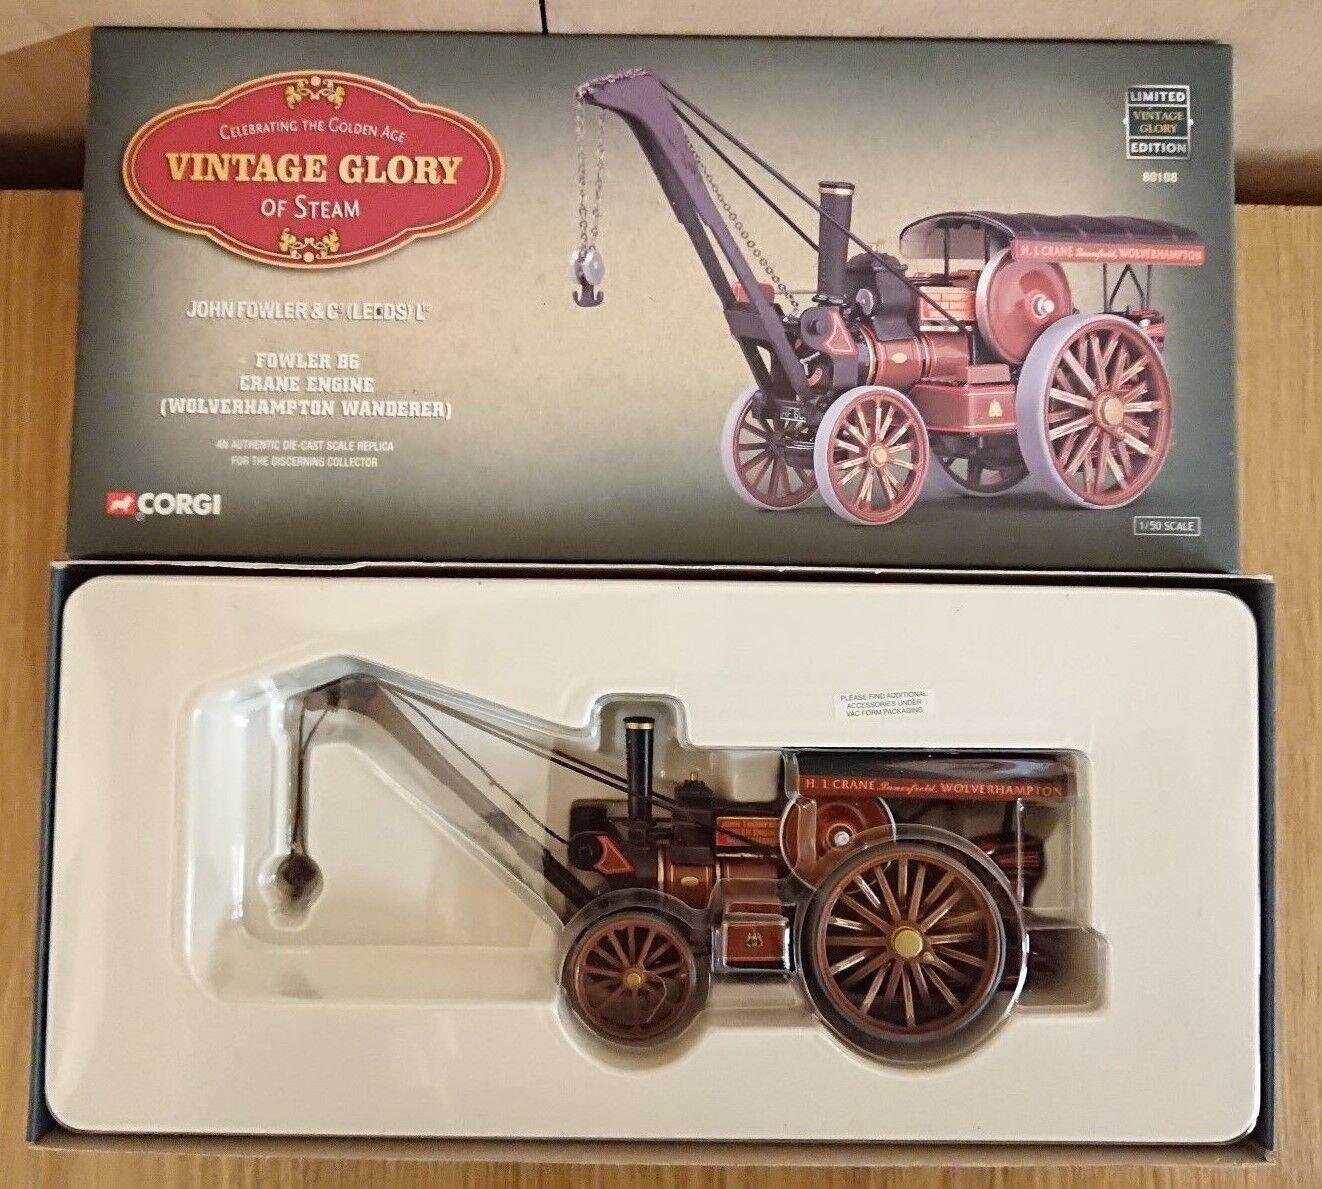 Corgi 80108 Fowler B6 Crane Engine Wolverhampton Wanderer Ltd Edition